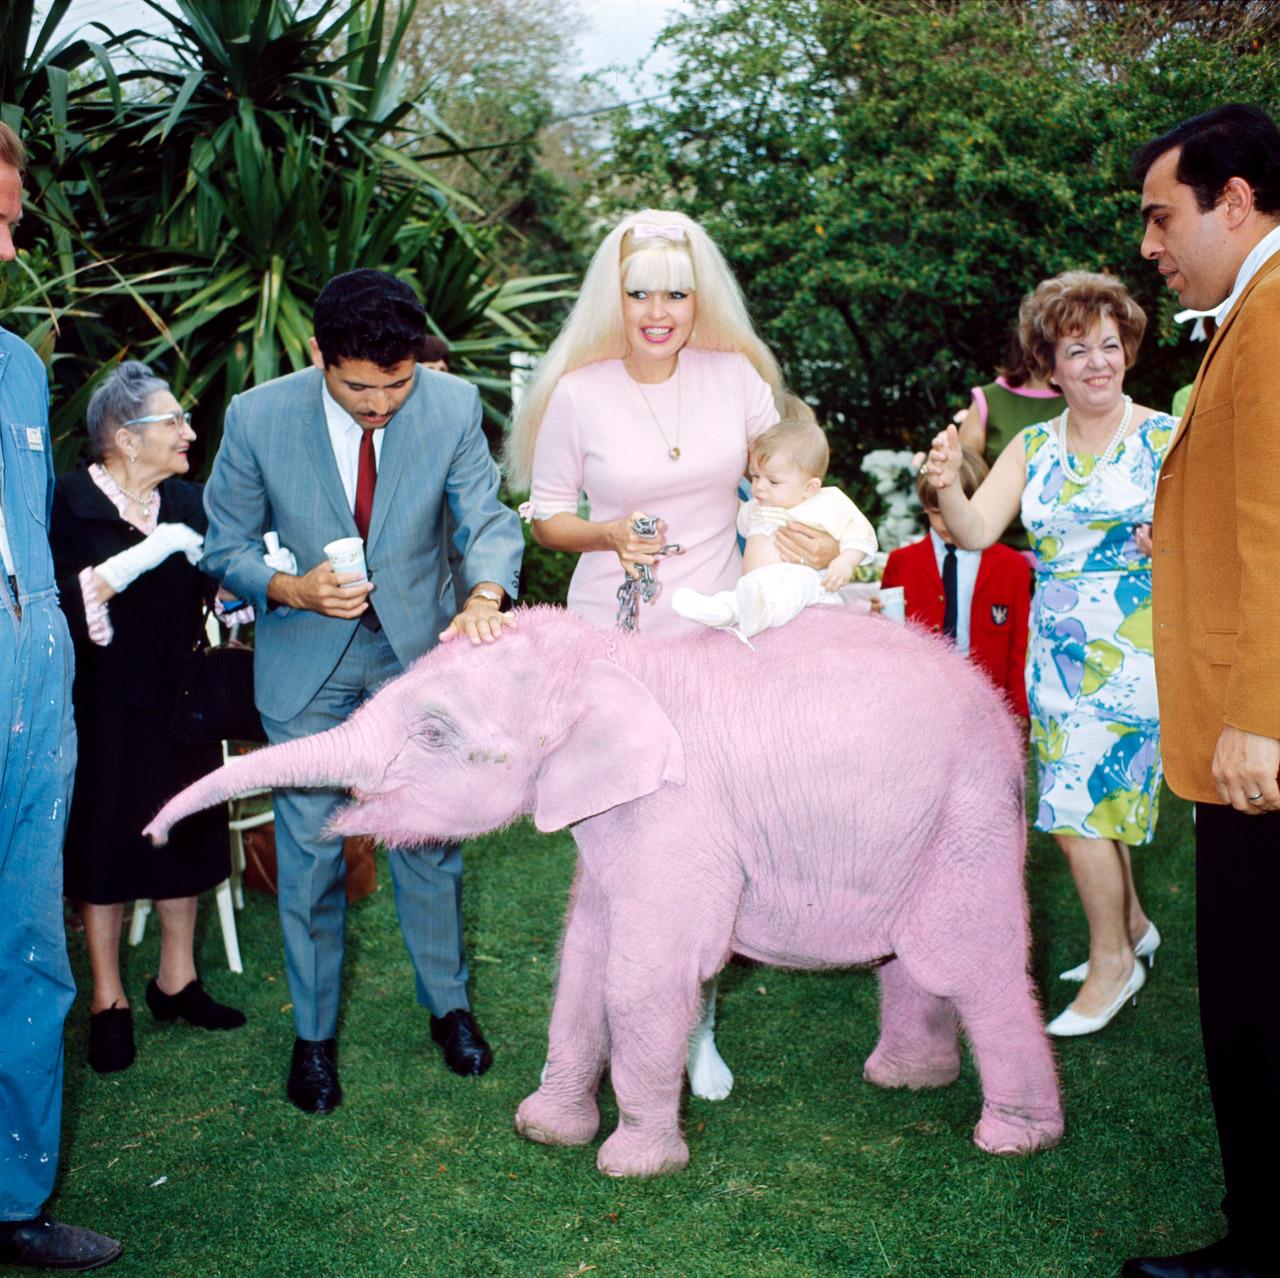 http://2.bp.blogspot.com/_1I7KiCuAU4k/TGwneH5GQKI/AAAAAAAAGUk/rXUSSHWZ0qk/s1600/jayne_mansfield_pink_elephant.jpg